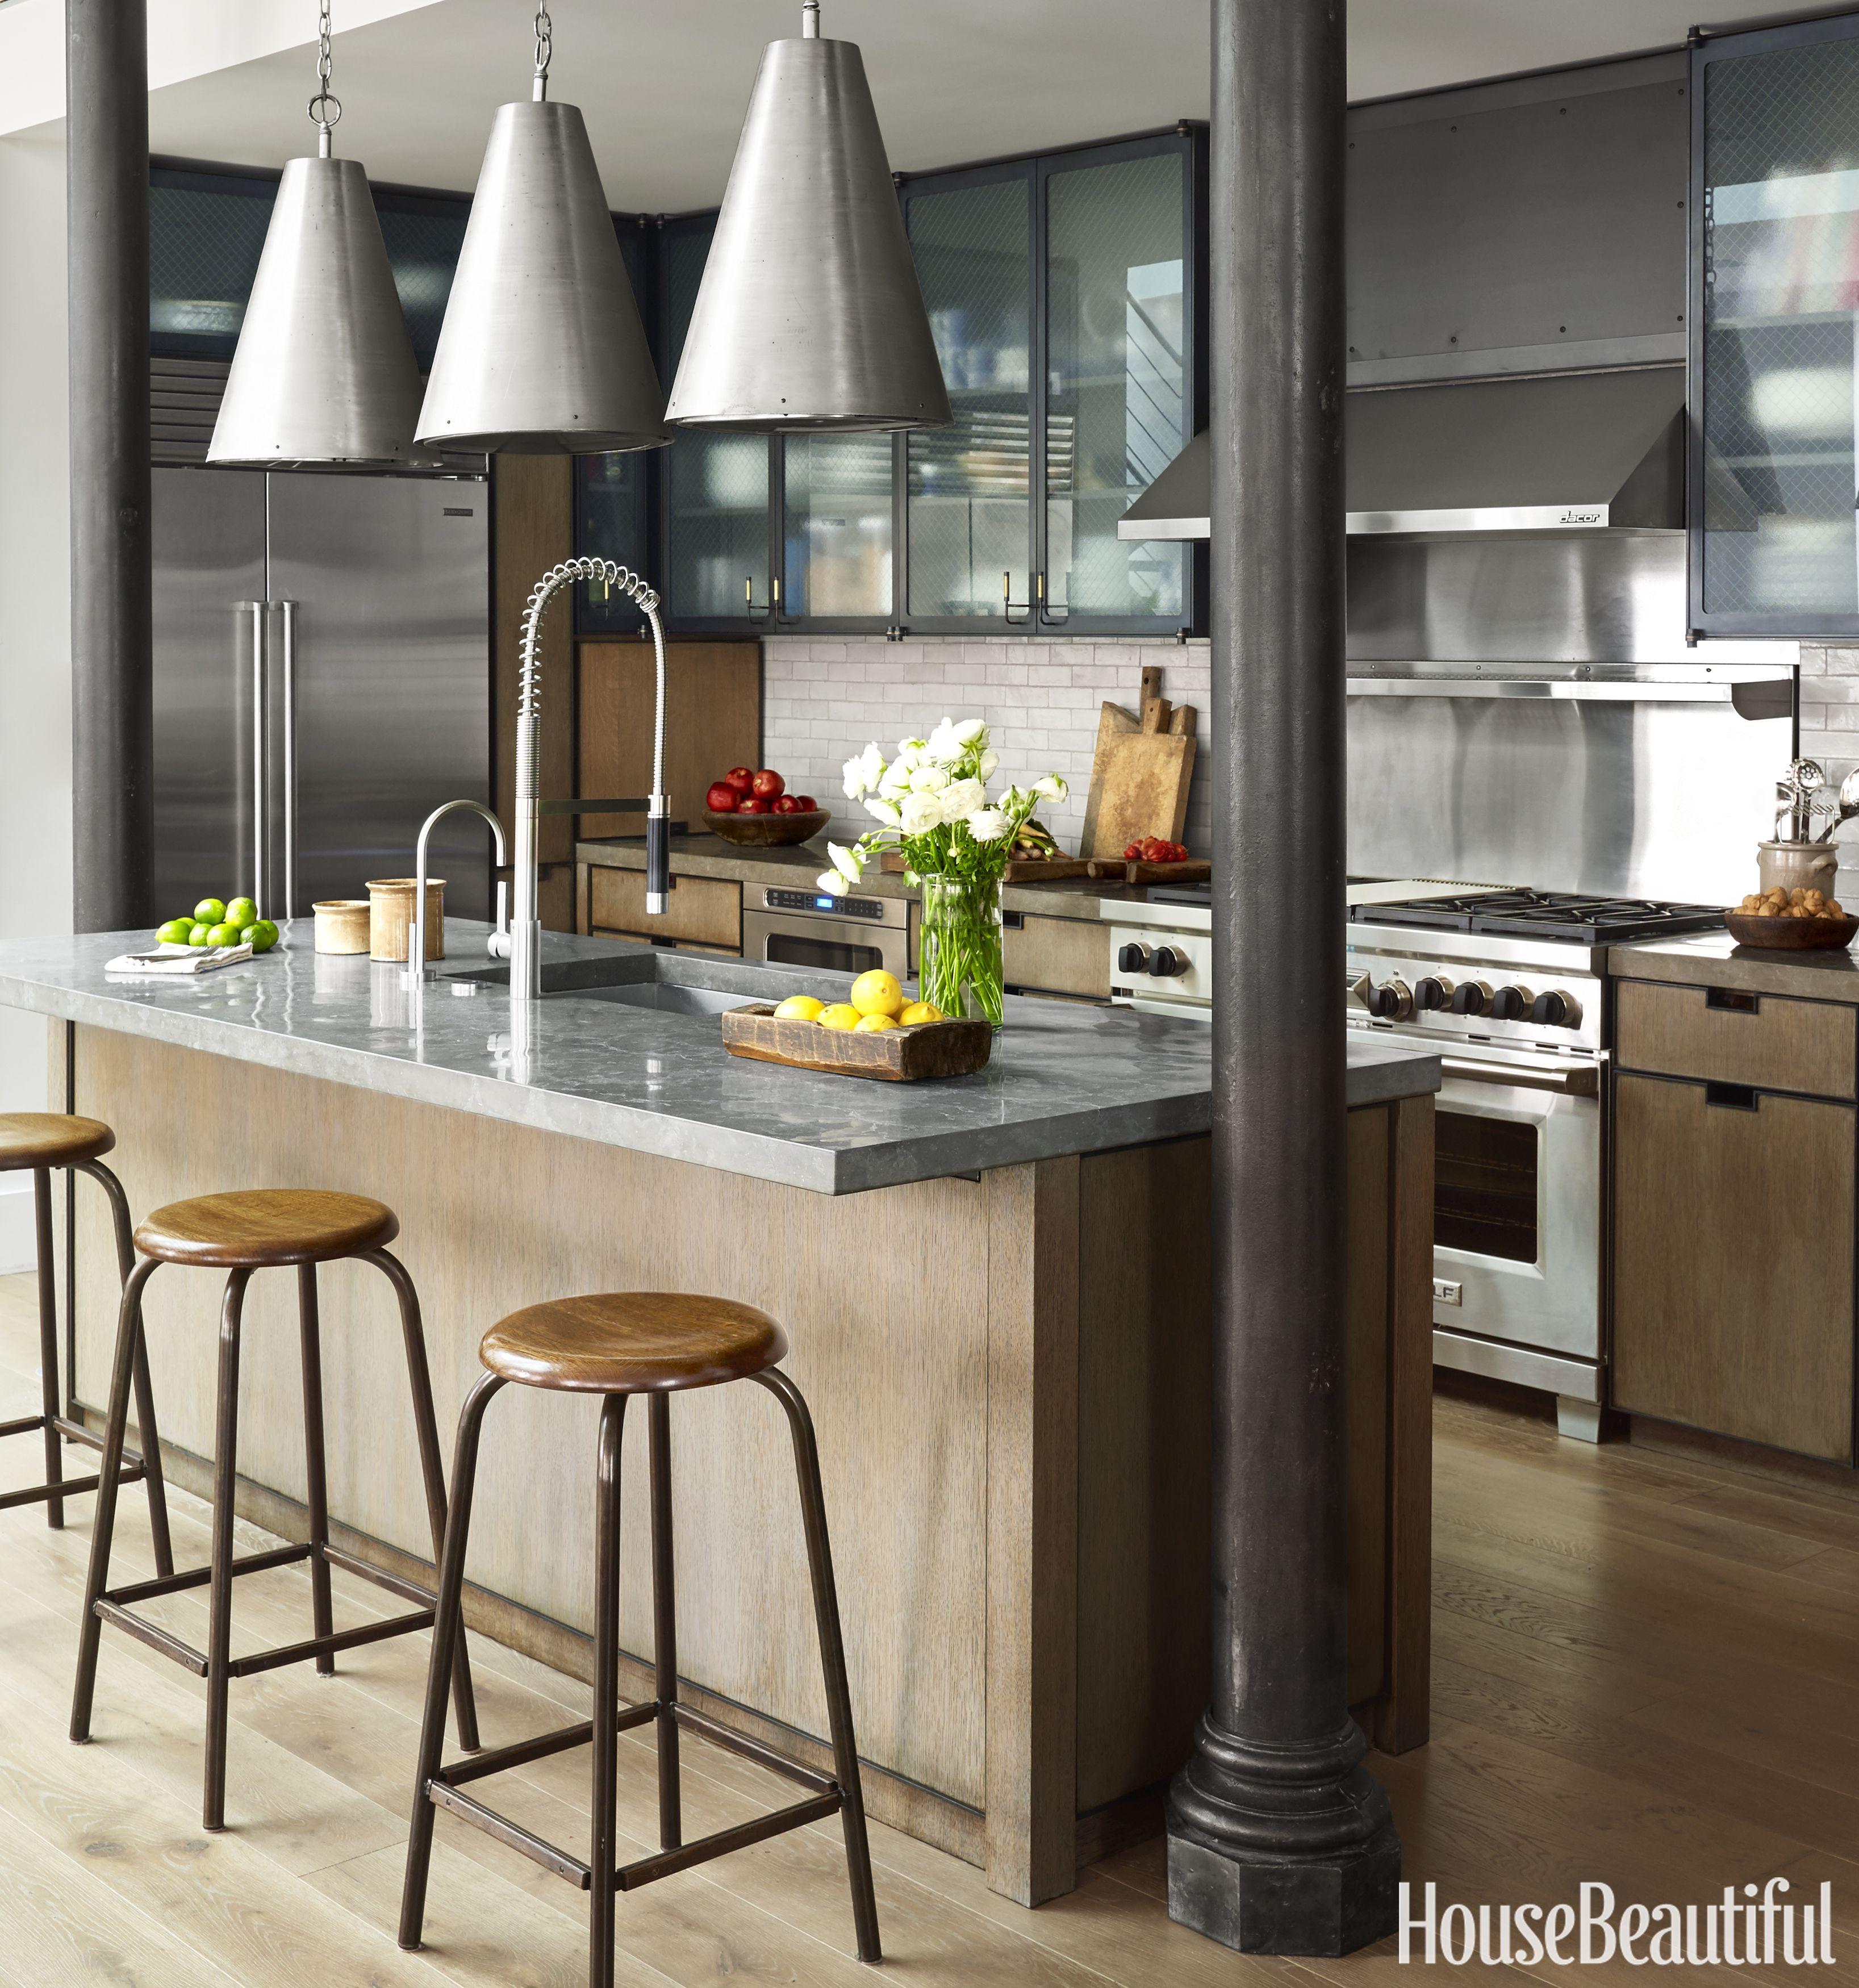 House Beautiful & Industrial Kitchen Design Ideas - Robert Stilin Interior Design